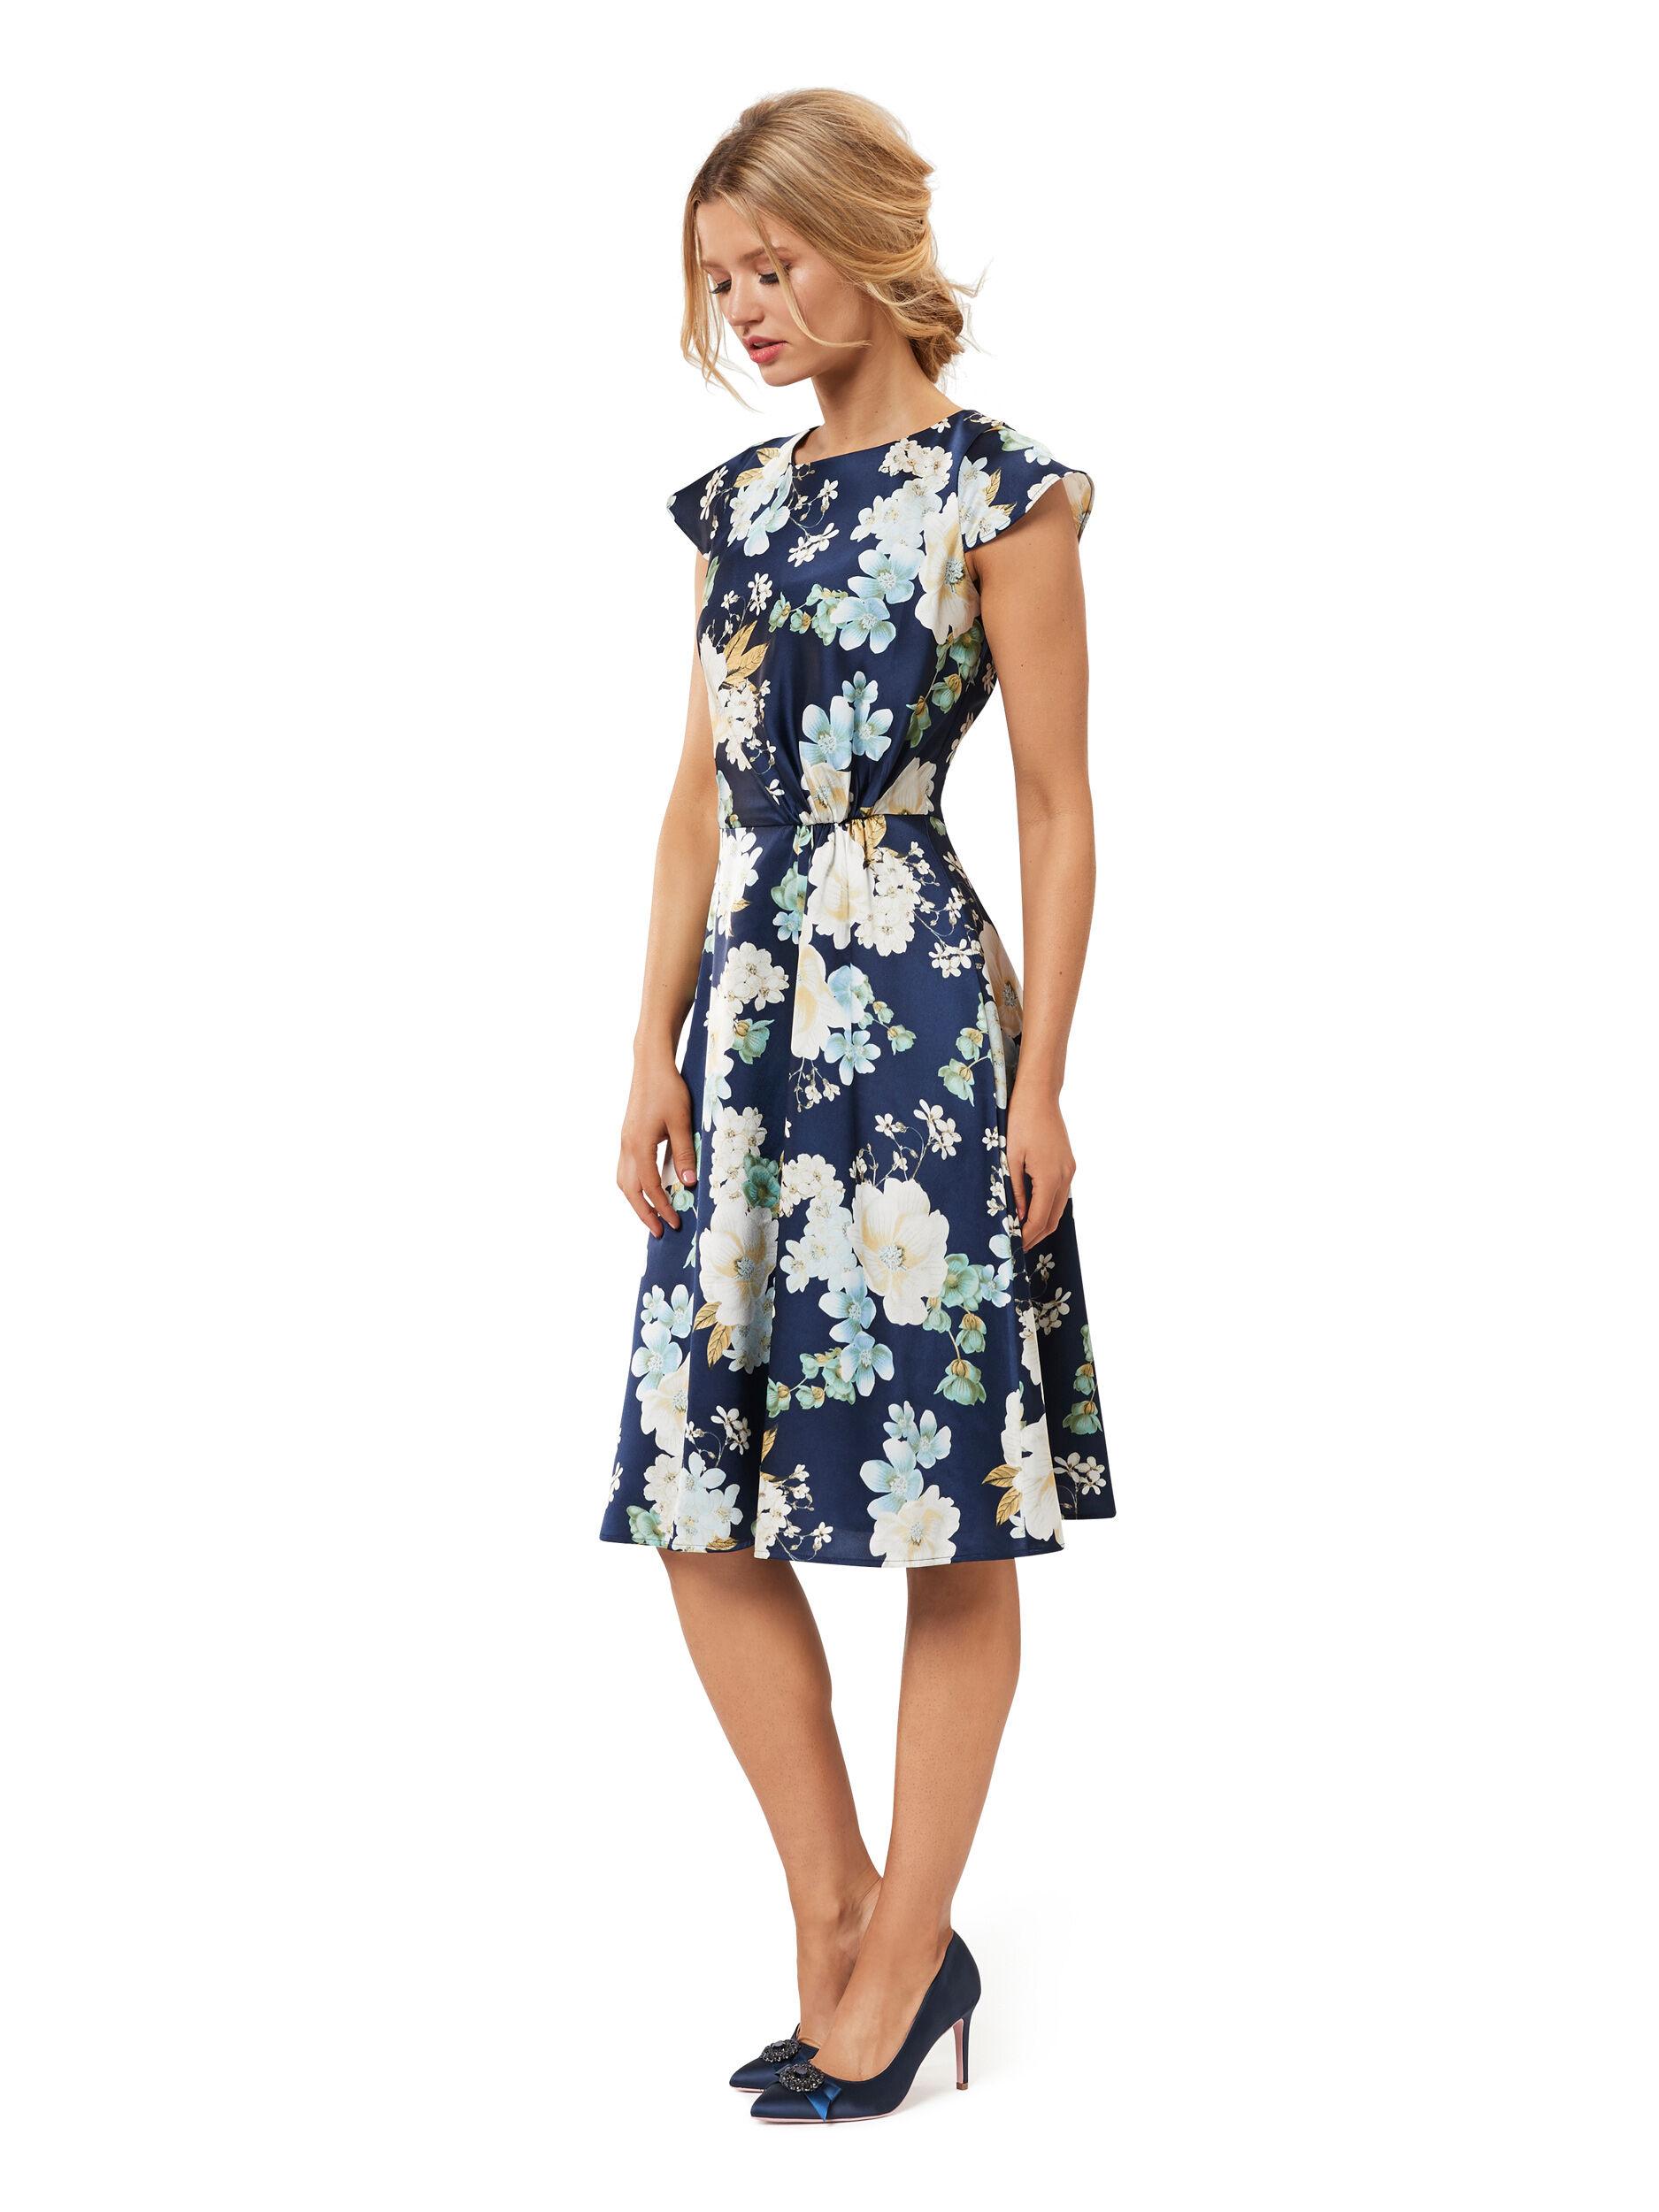 Daisy Blossom Dress